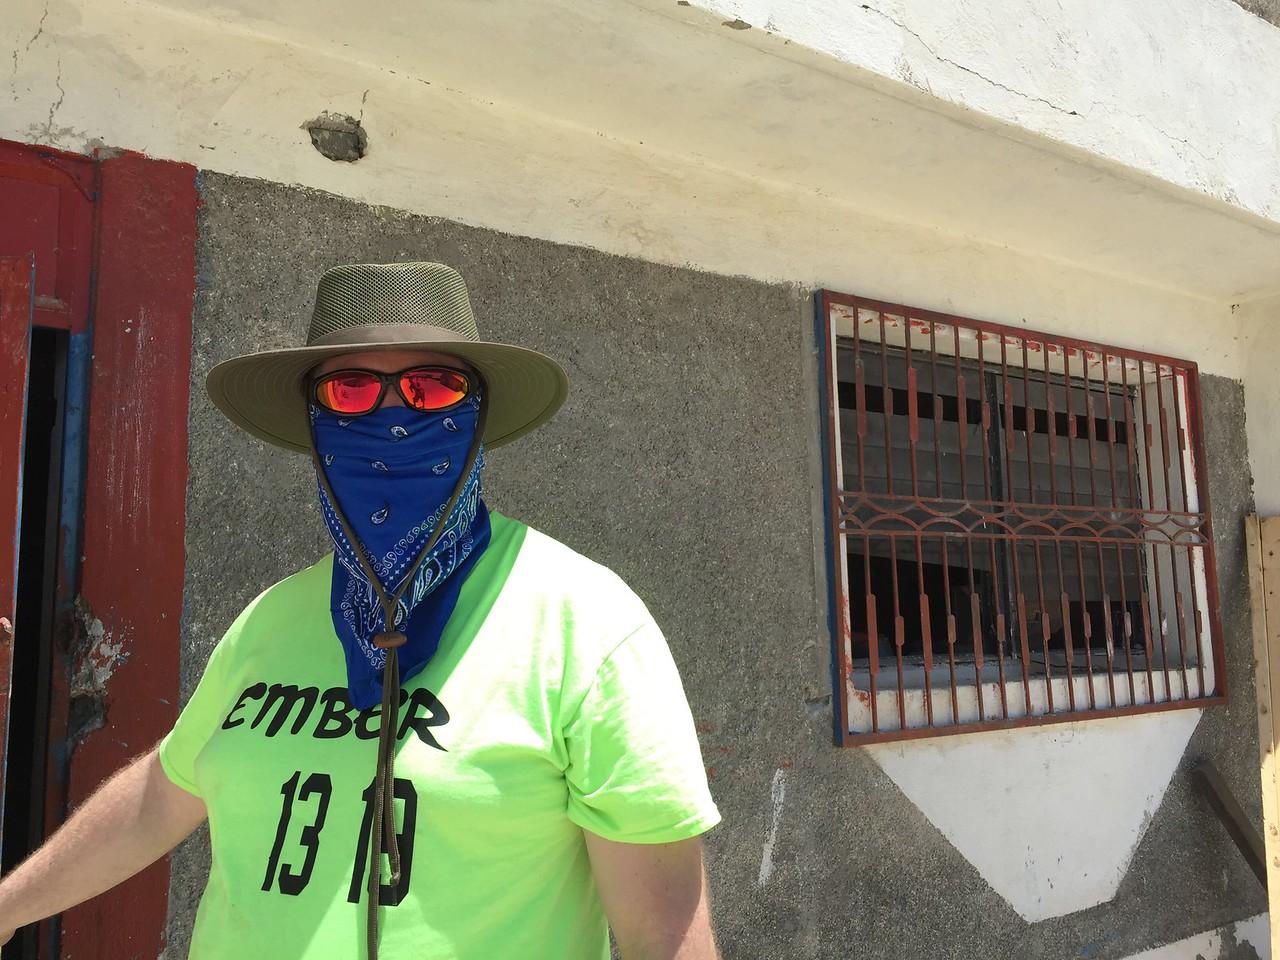 Haitian bandito?